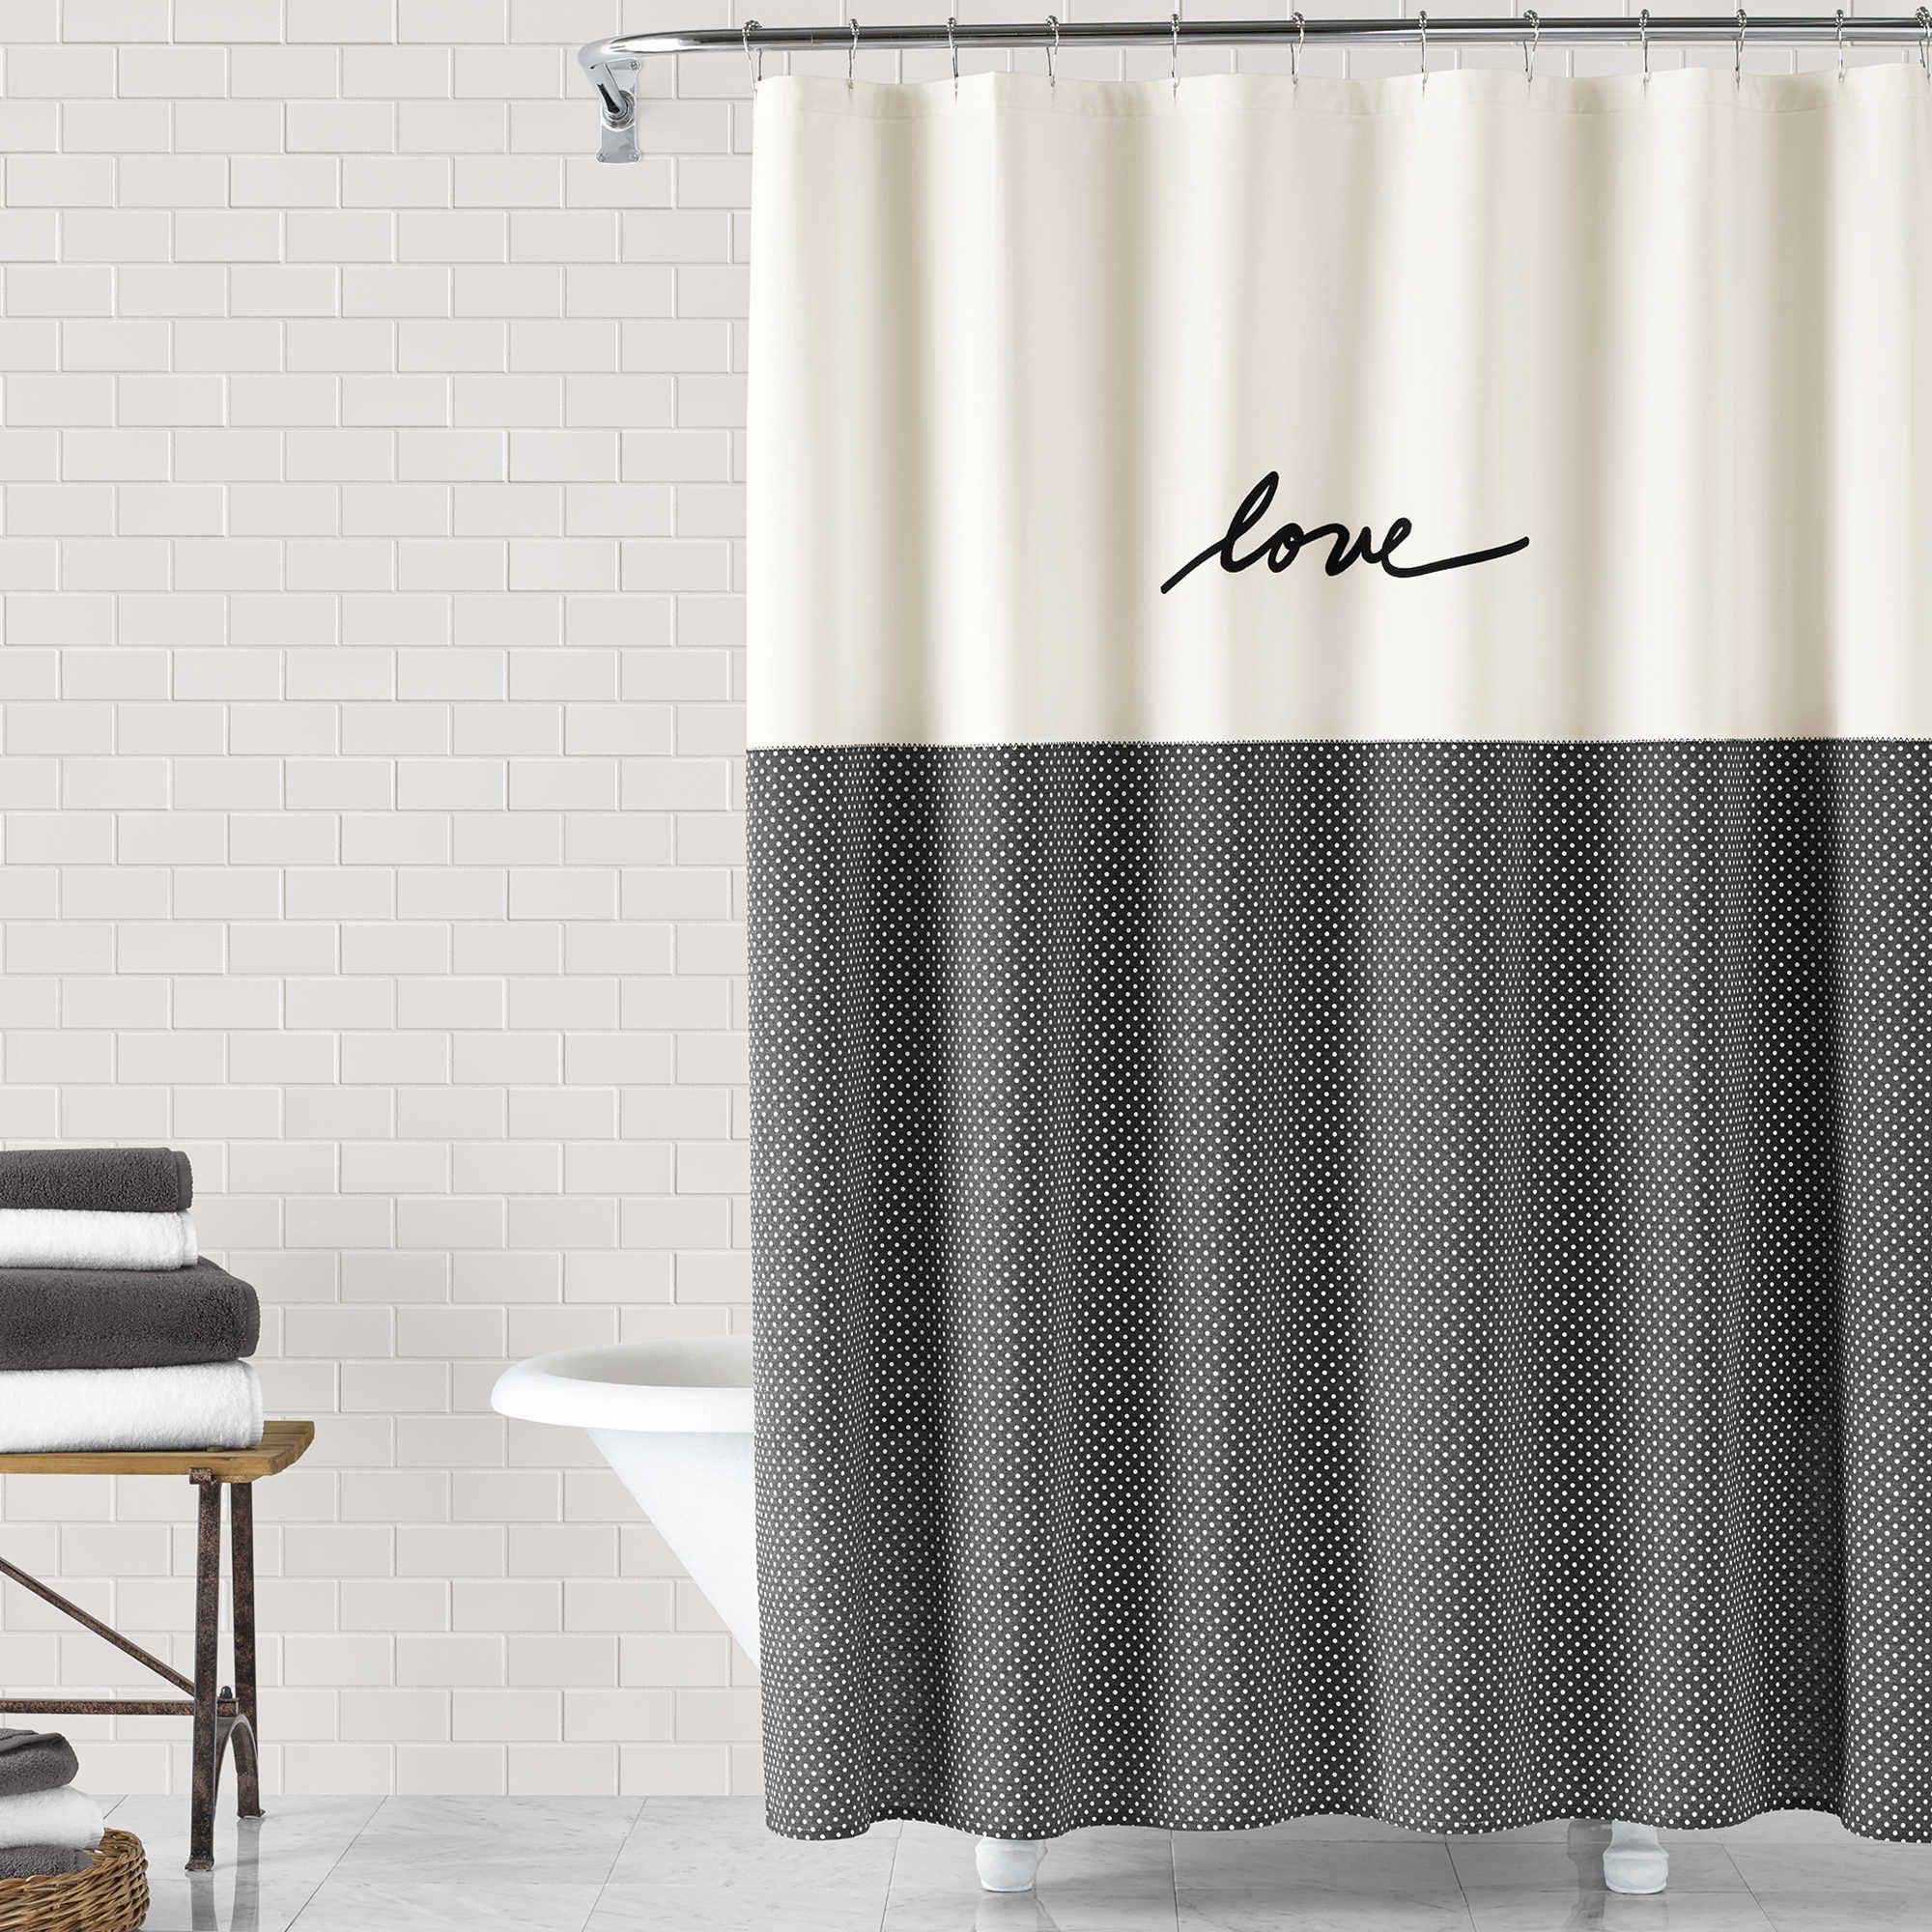 Pdp Main Image Bathroom Shower Curtains Long Shower Curtains